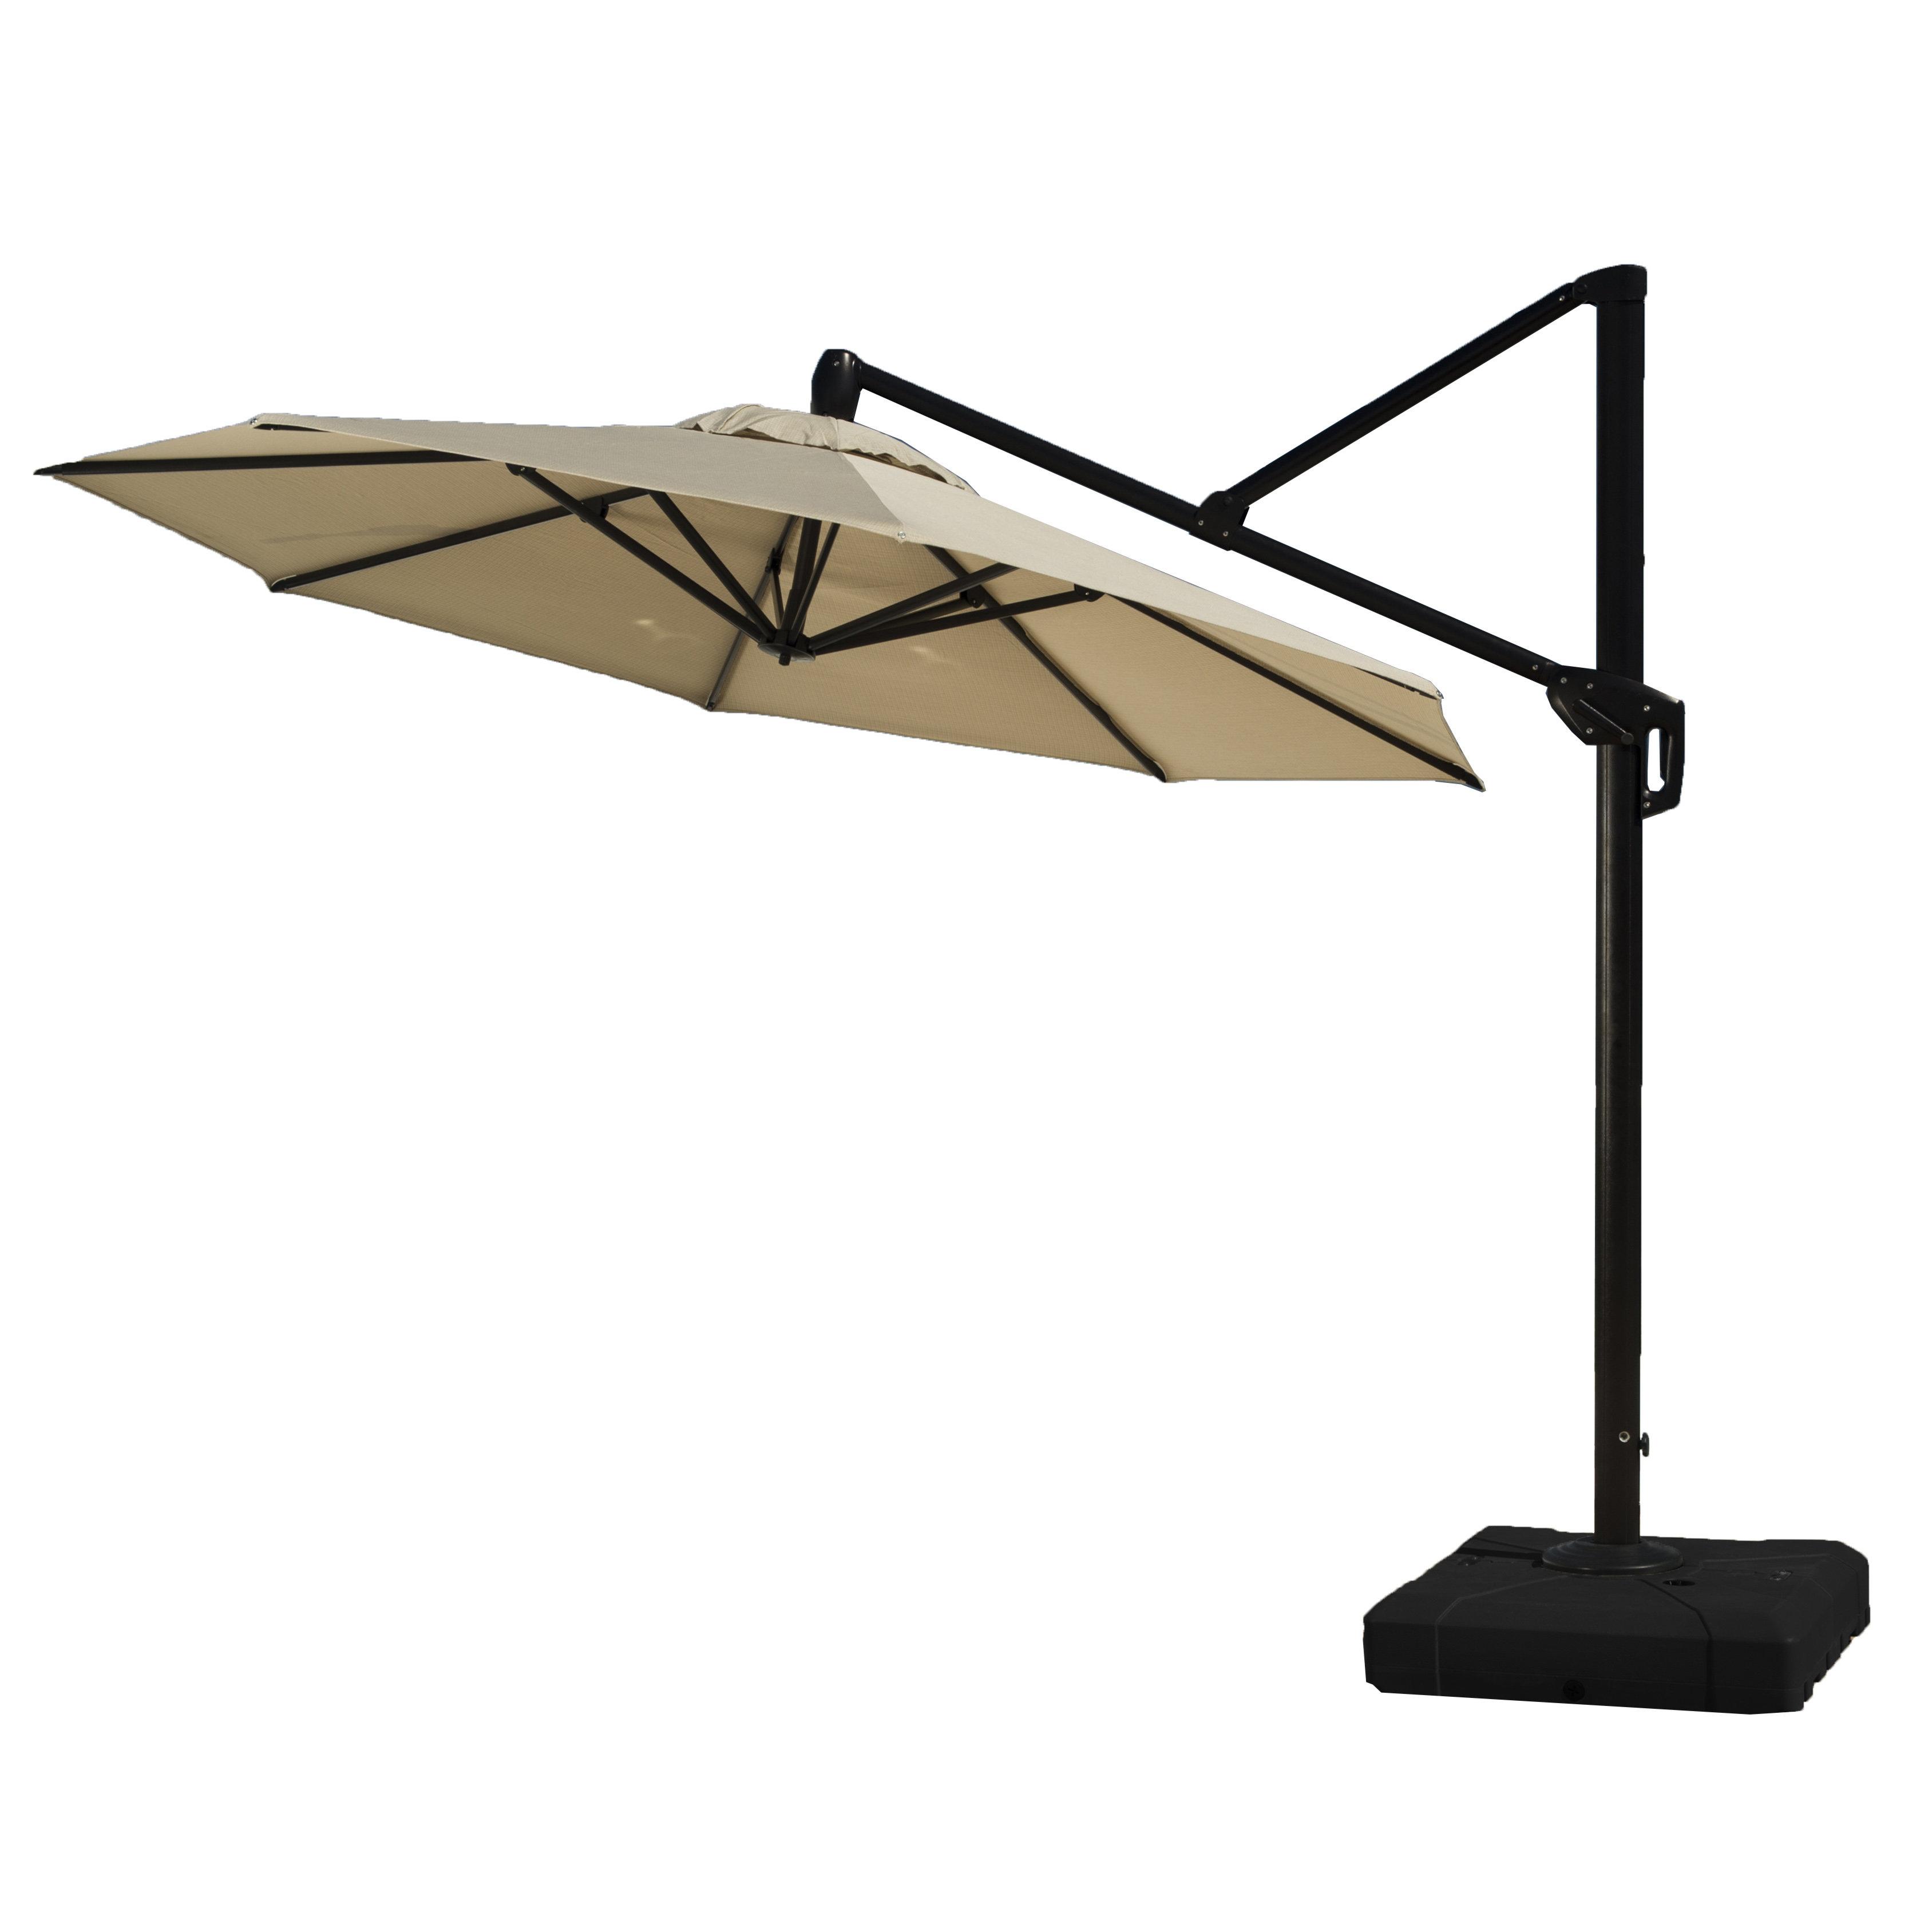 Well Known Nasiba Square Cantilever Sunbrella Umbrellas For Sol 72 Outdoor Ceylon 10' Cantilever Sunbrella Umbrella (View 12 of 20)